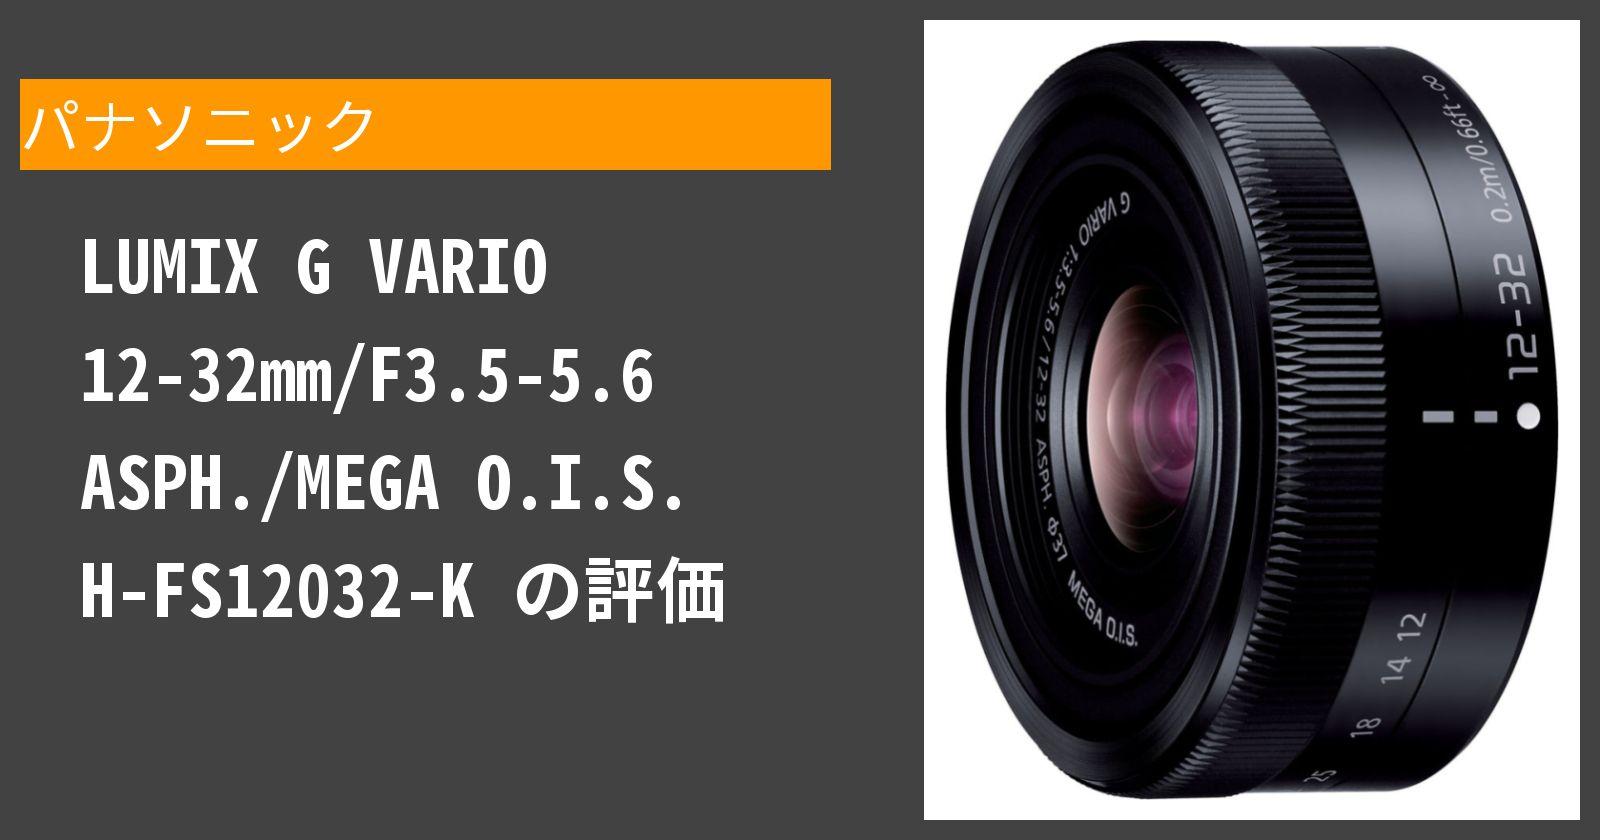 LUMIX G VARIO 12-32mm/F3.5-5.6 ASPH./MEGA O.I.S. H-FS12032-Kを徹底評価